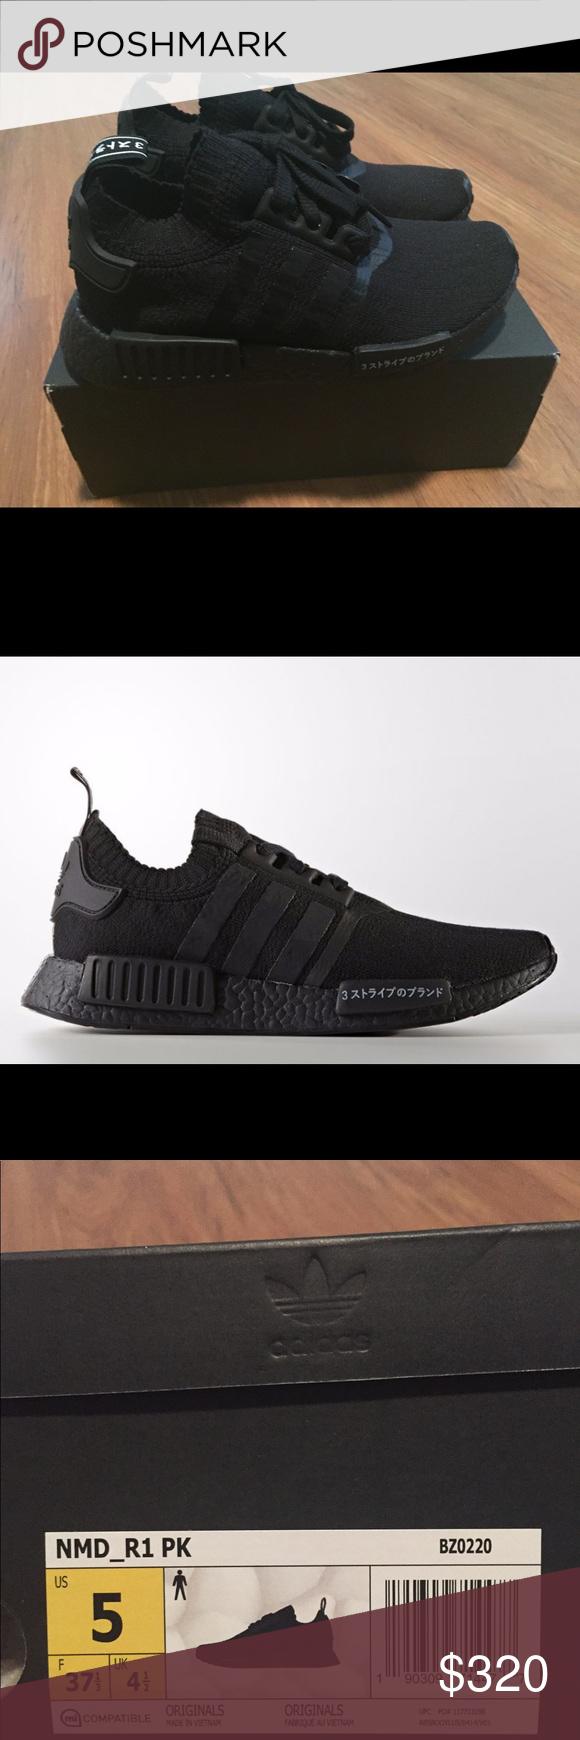 adidas nmd r1 pk giappone triple black noi taglia 5 uomini triple black